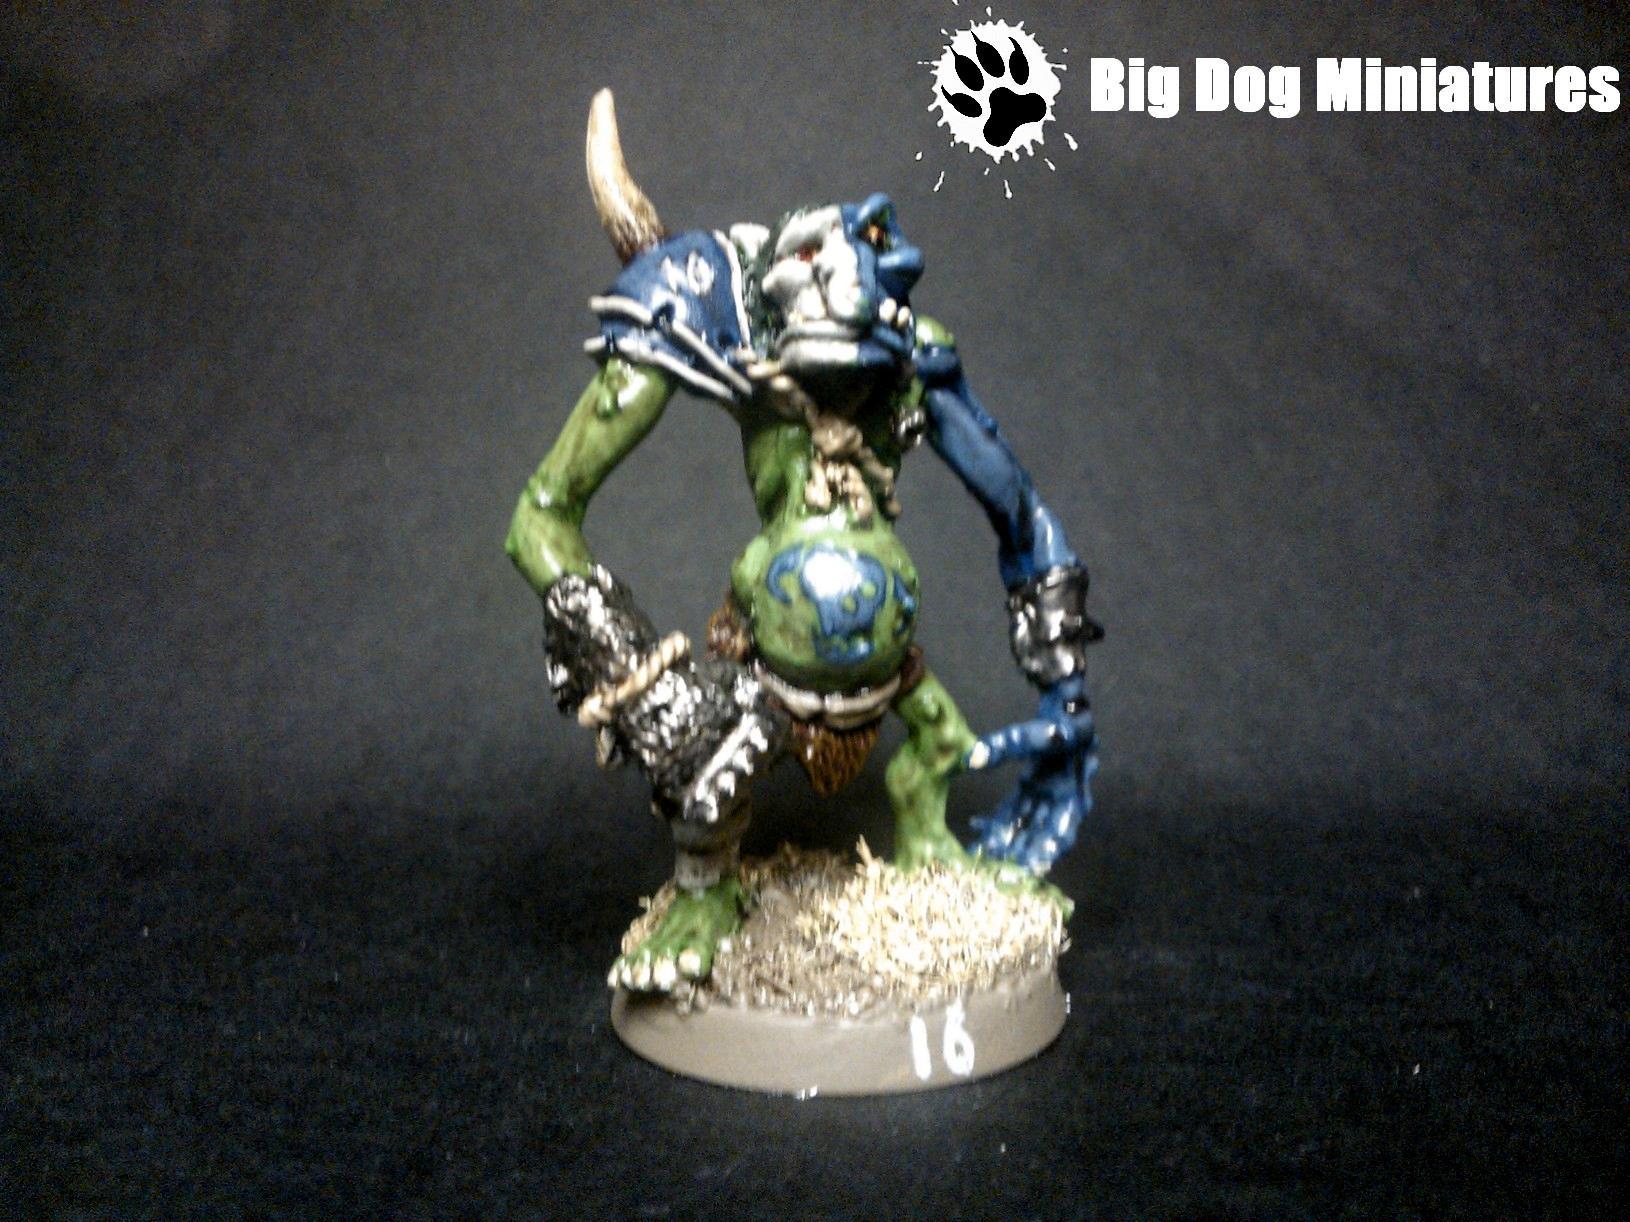 Big Dog Miniatures, Blood, Bowl, Cheerleader, Goblins, Painting, Troll, War